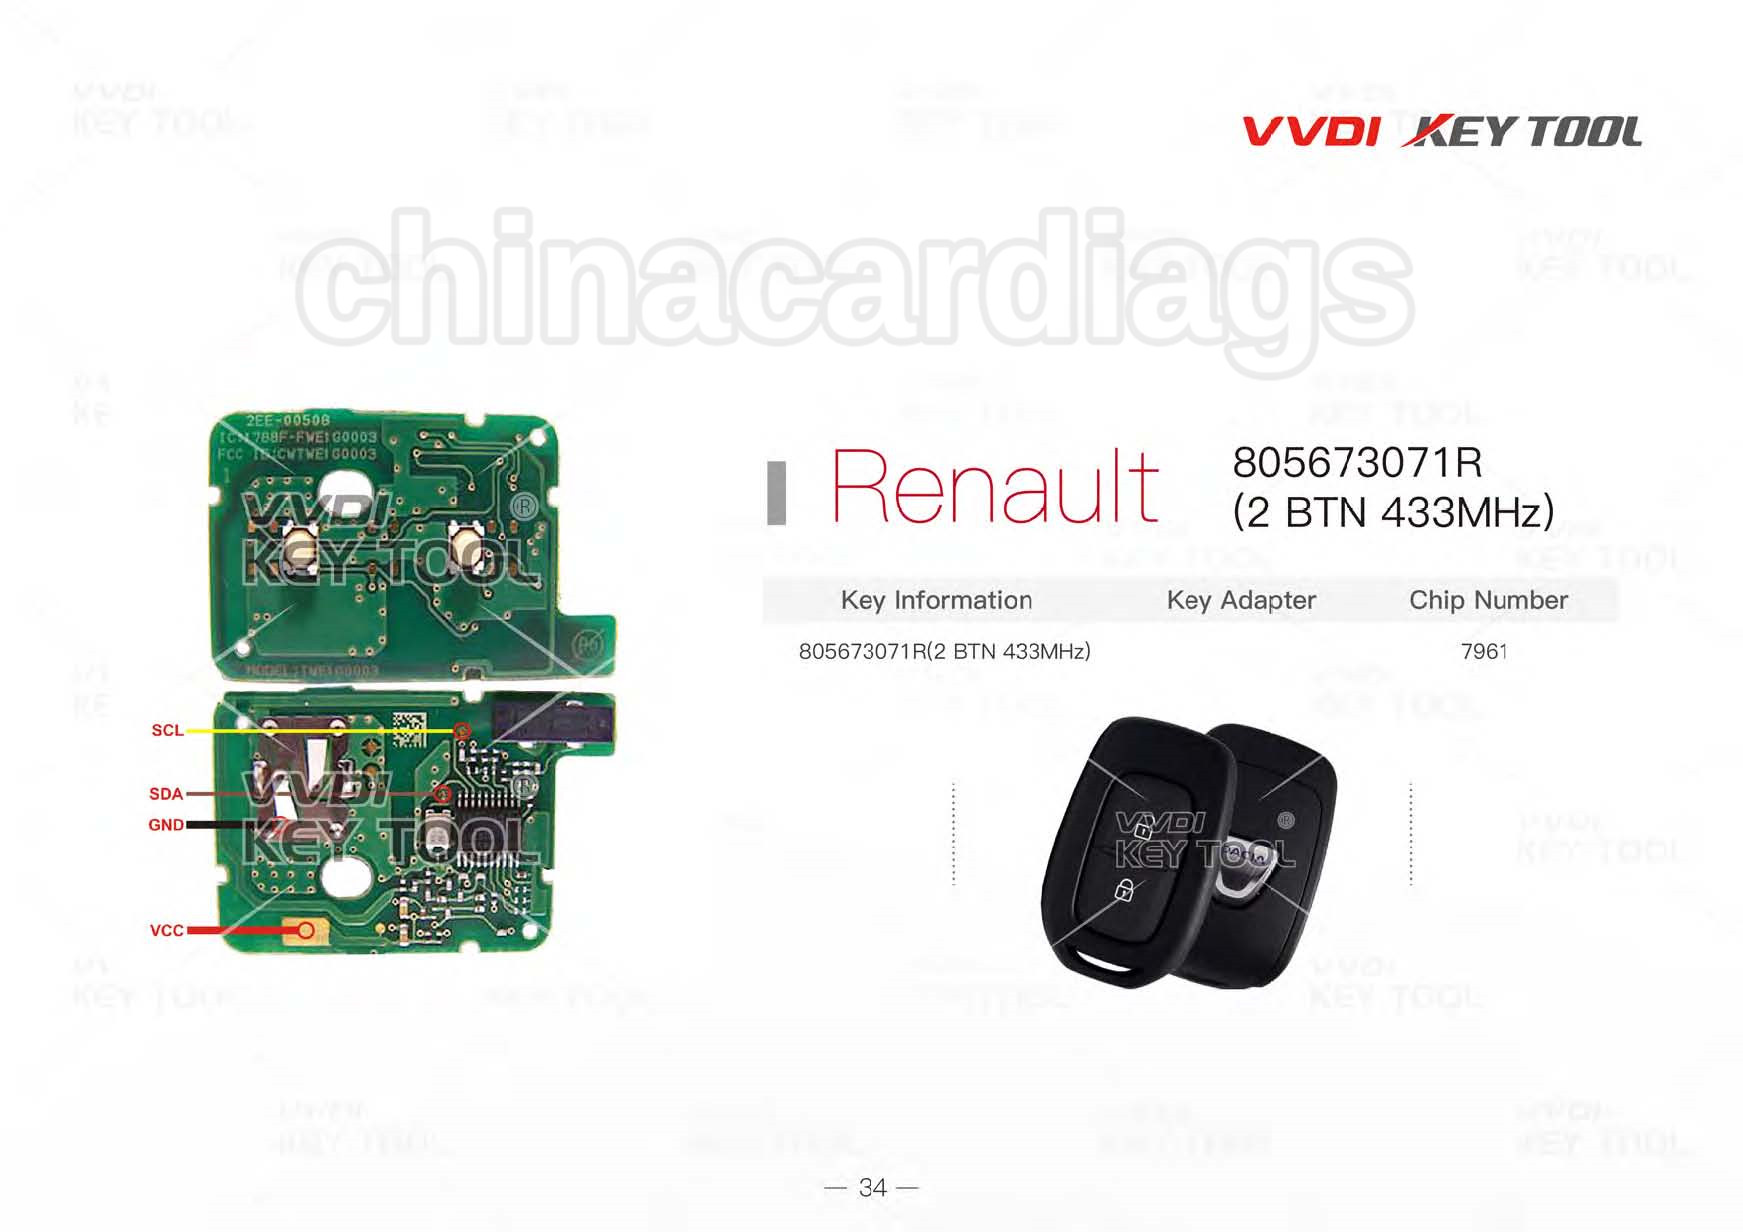 vvdi-key-tool-renew-diagram-34